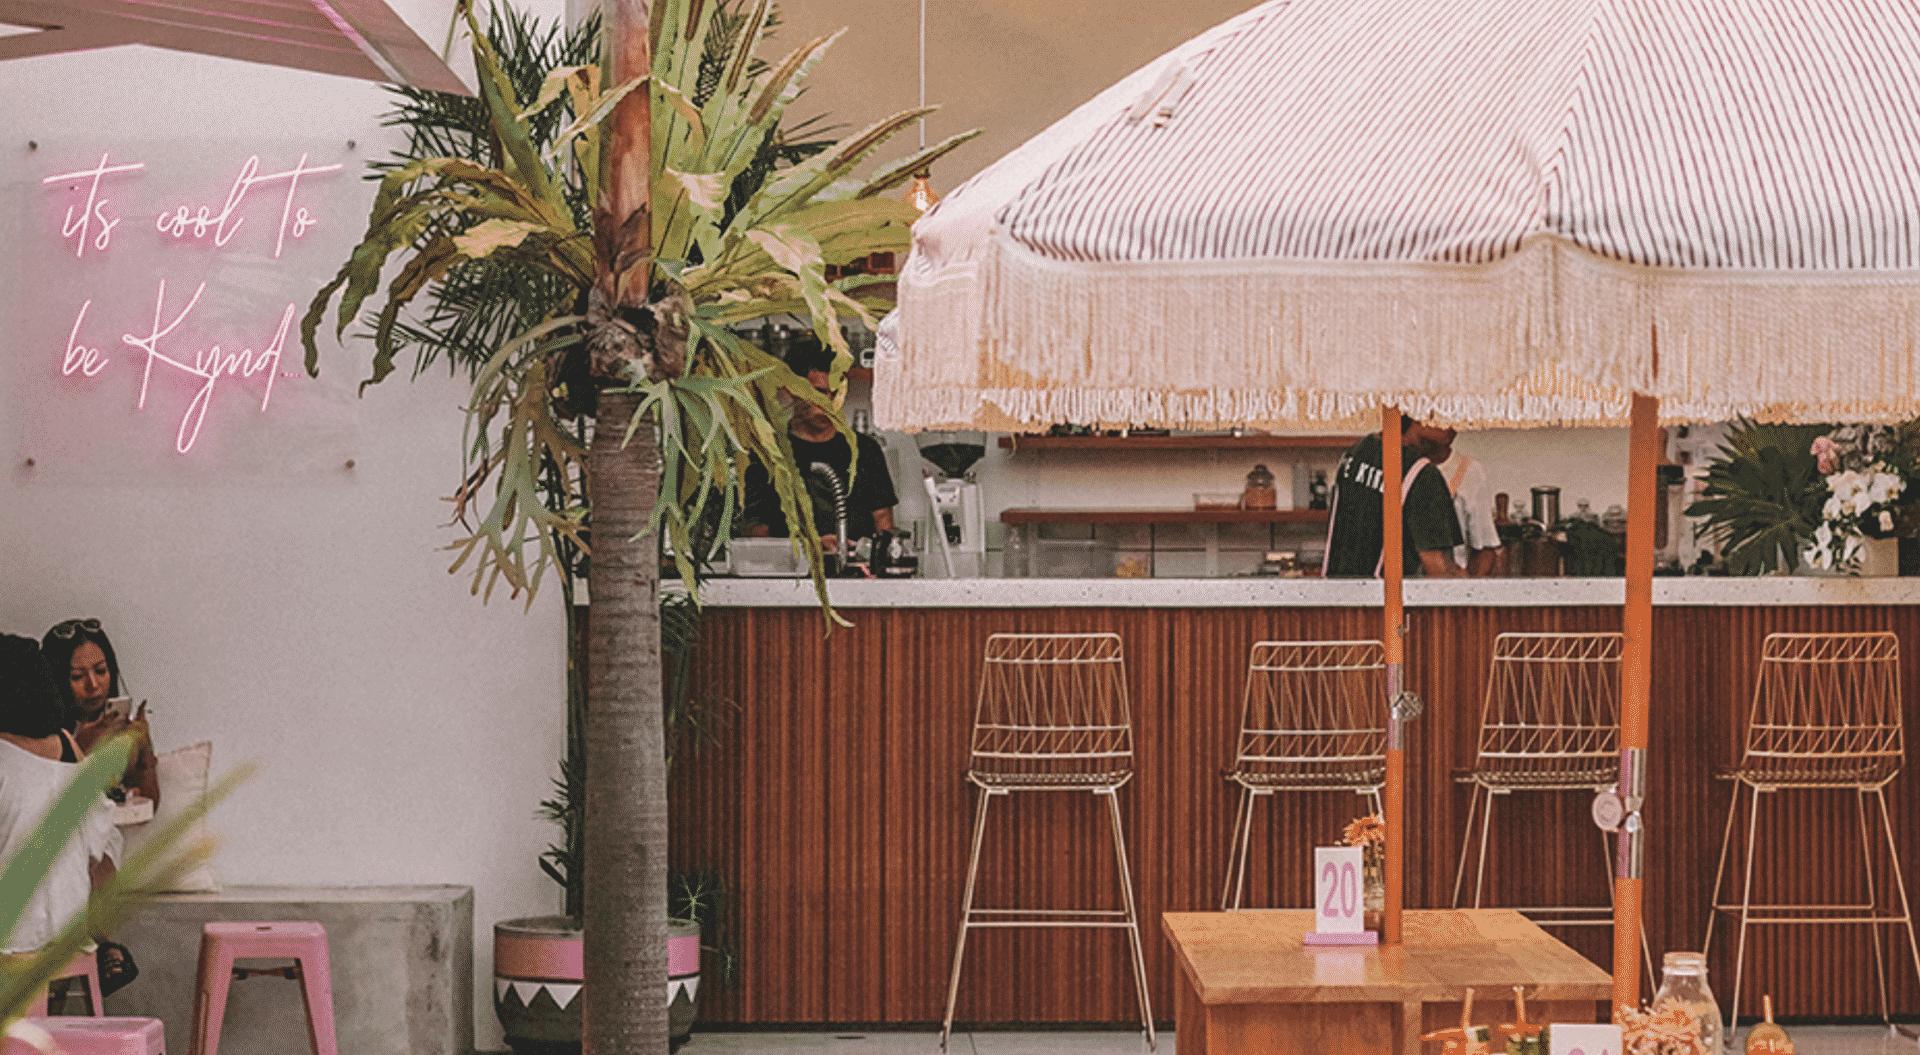 KYND Cafe in Bali